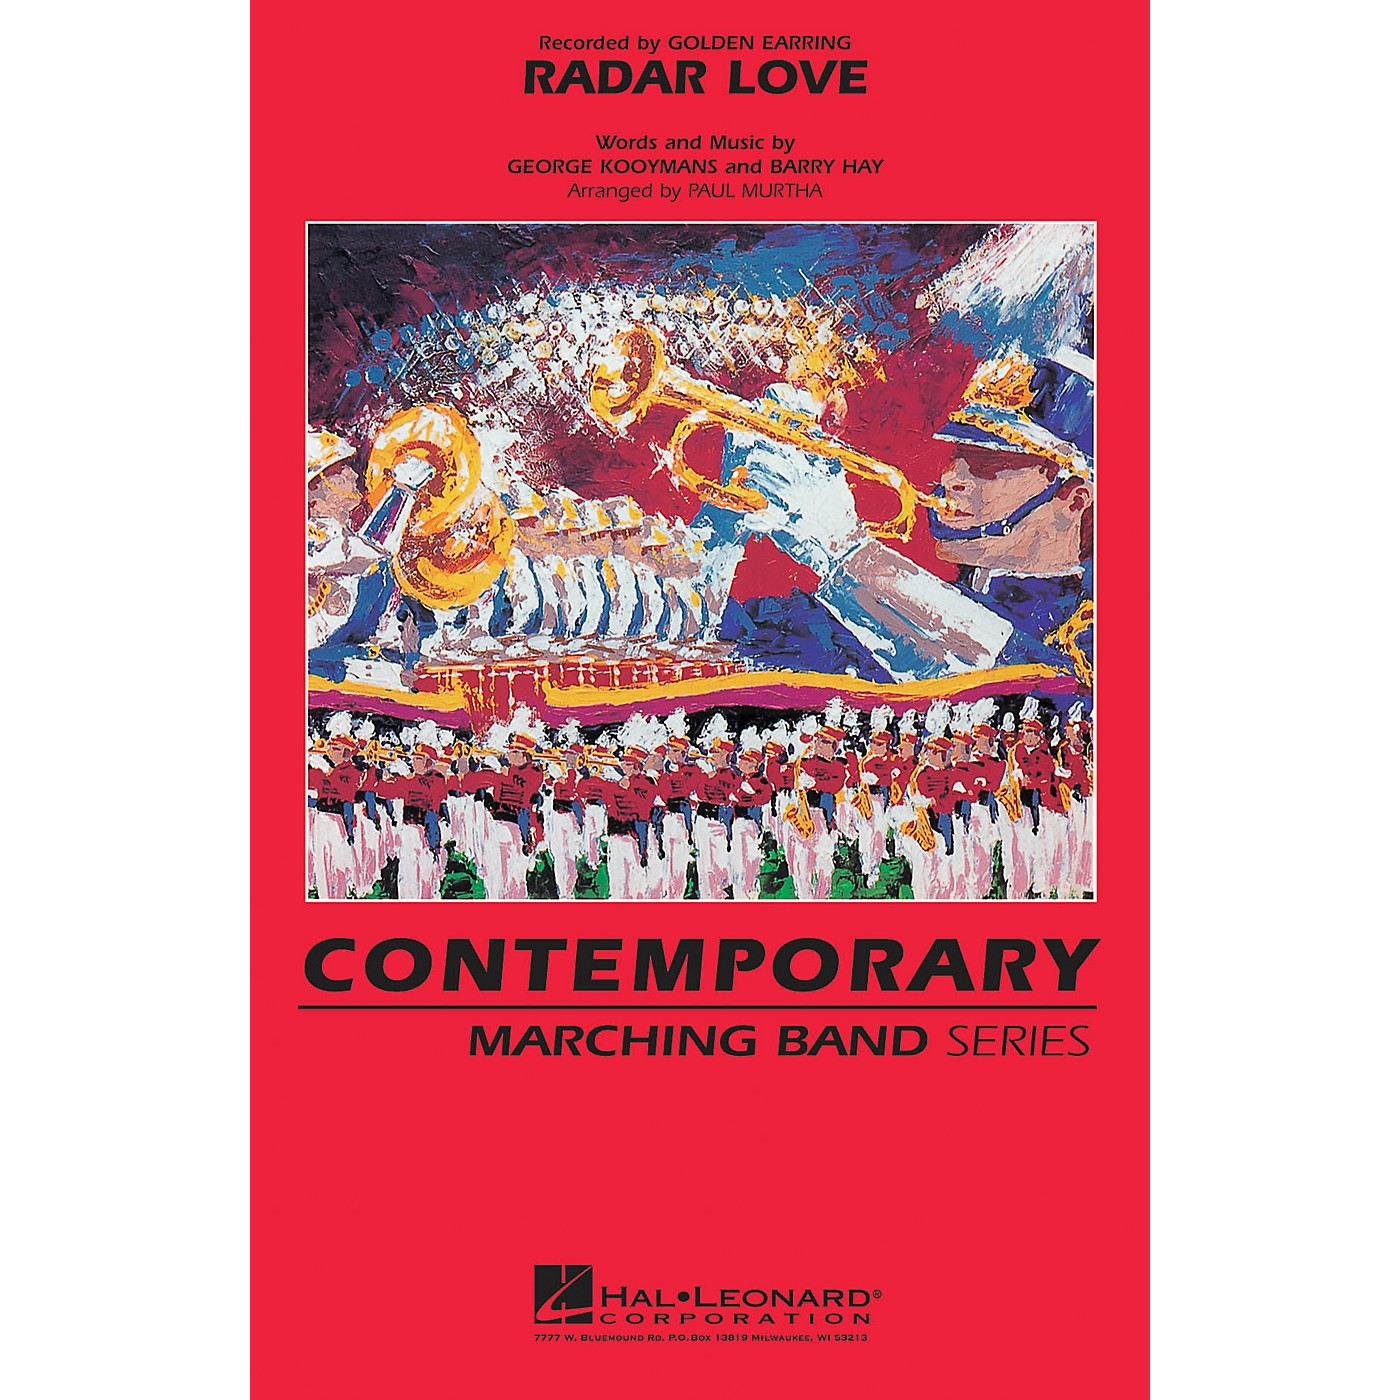 Hal Leonard Radar Love Marching Band Level 3 by Golden Earring Arranged by Paul Murtha thumbnail